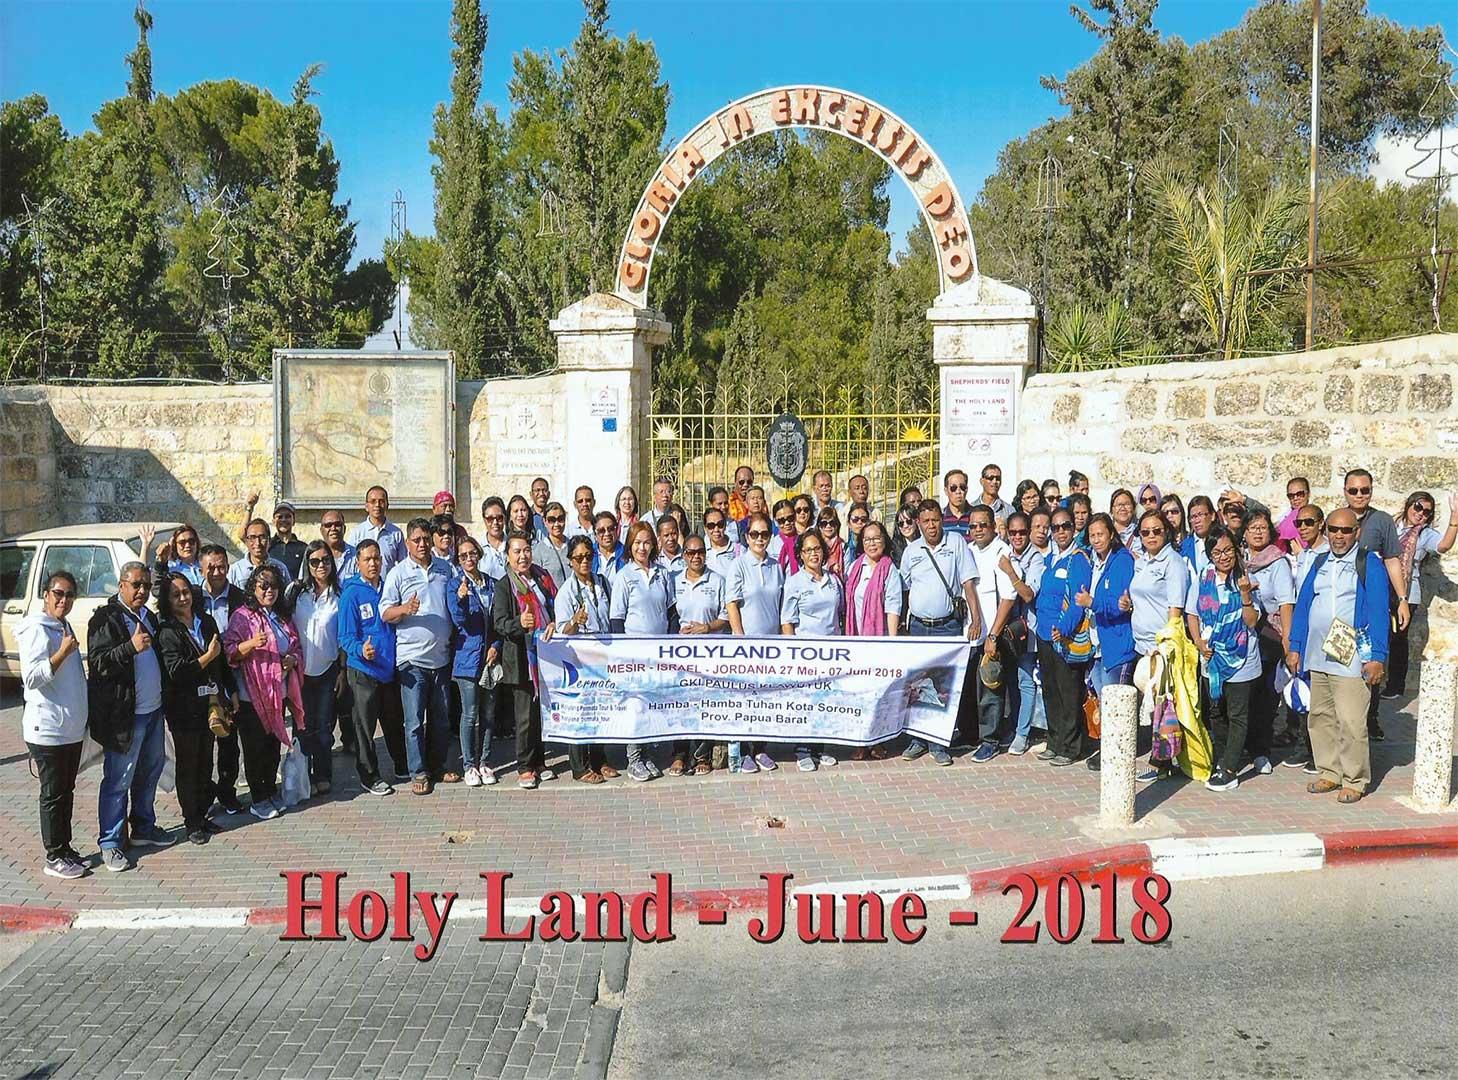 wisata rohani holyland tour